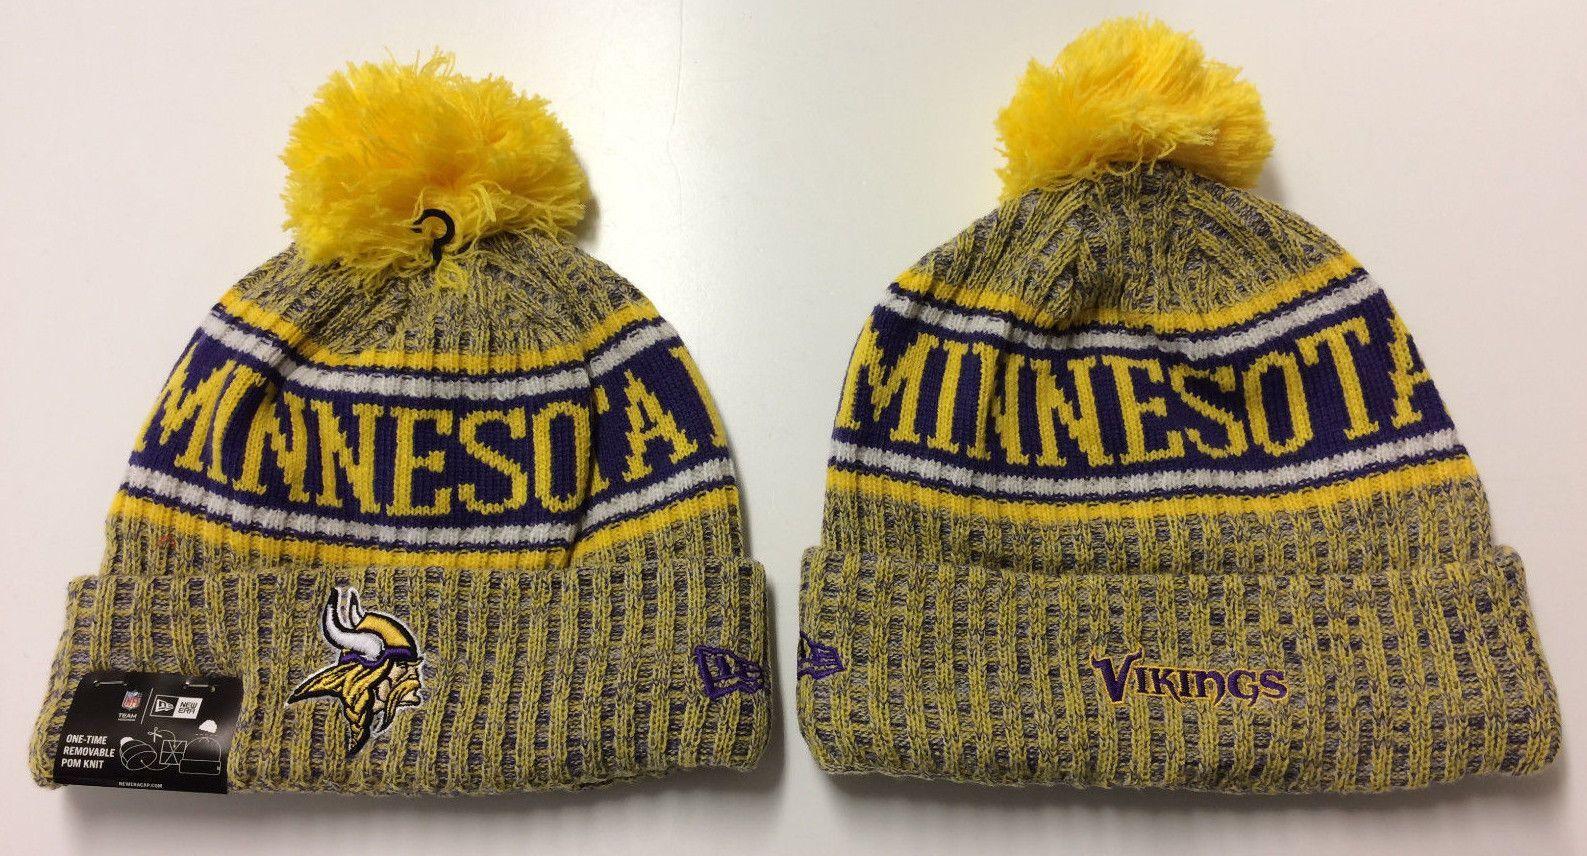 Minnesota Vikings New Era Knit Hat On Field 2018 Sideline Beanie Stocking Cap